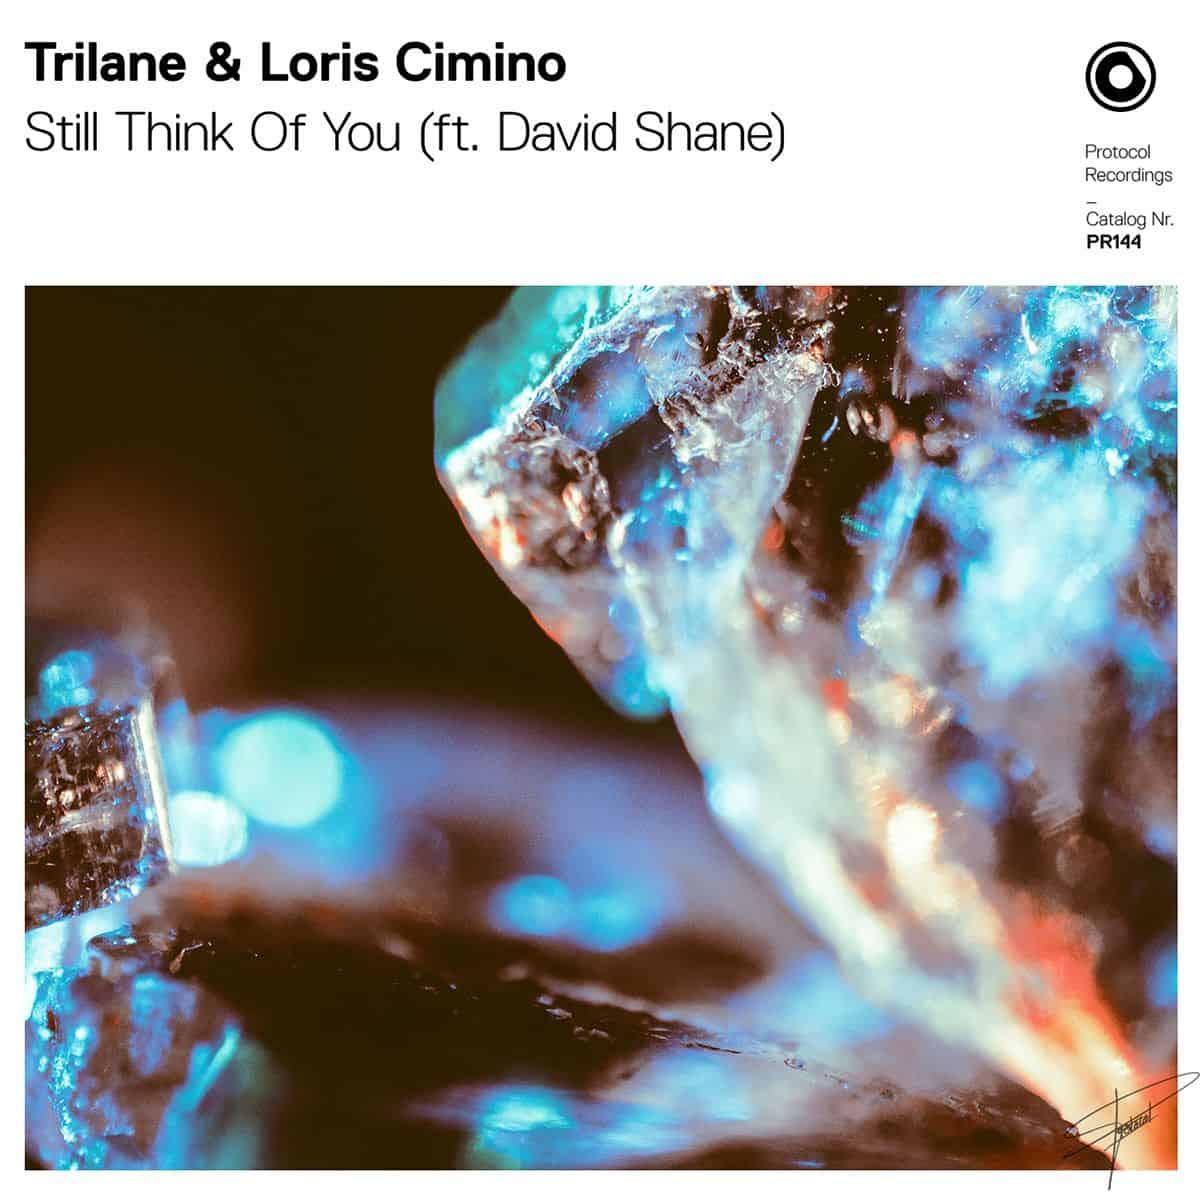 Trilane & Loris Cimino release 'Still Think Of You'